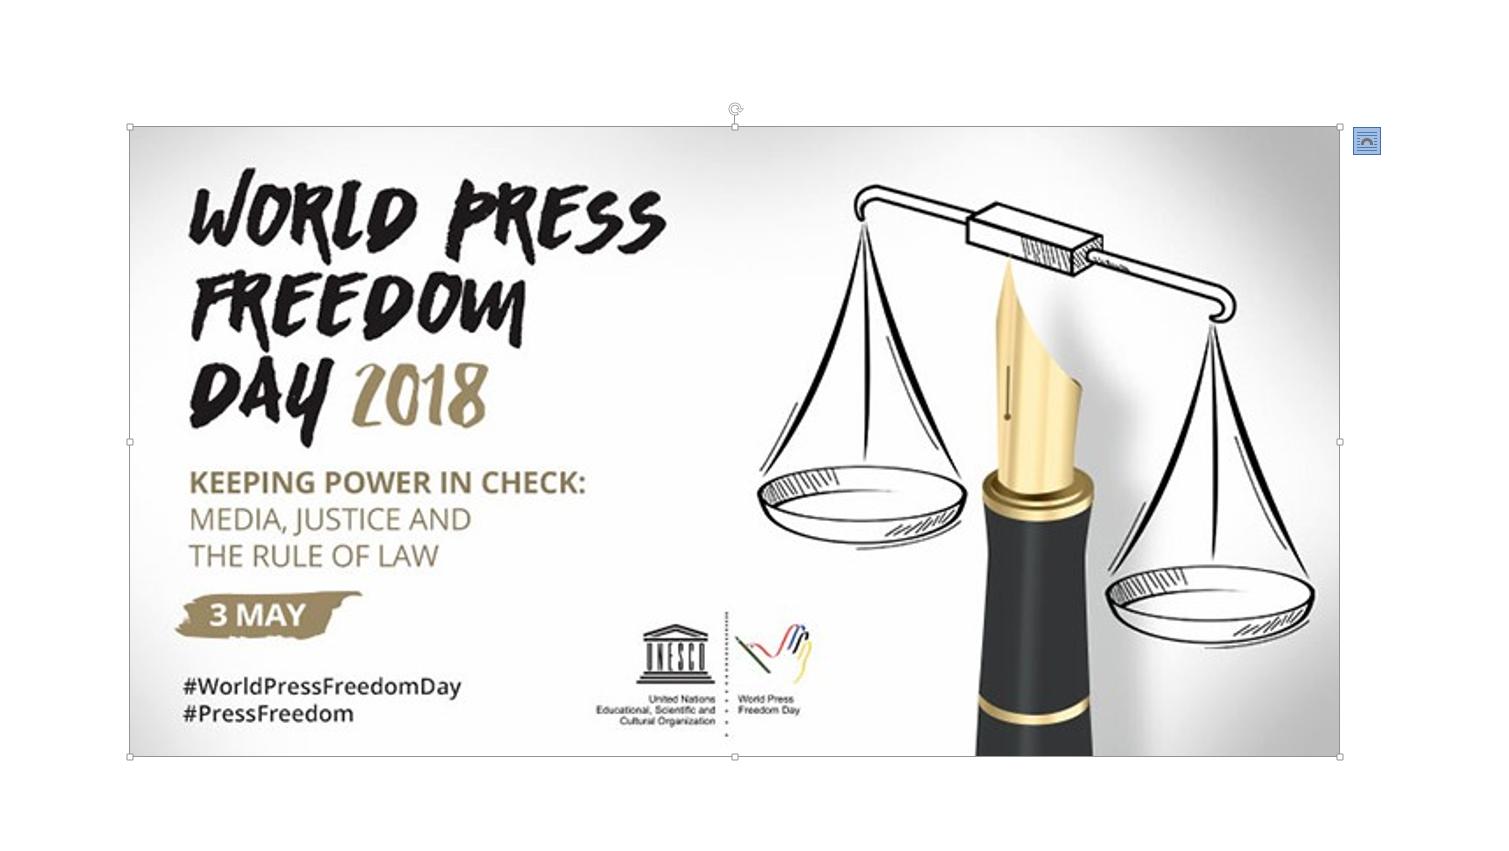 World Press Freedom Day 2018 世界新聞自由日